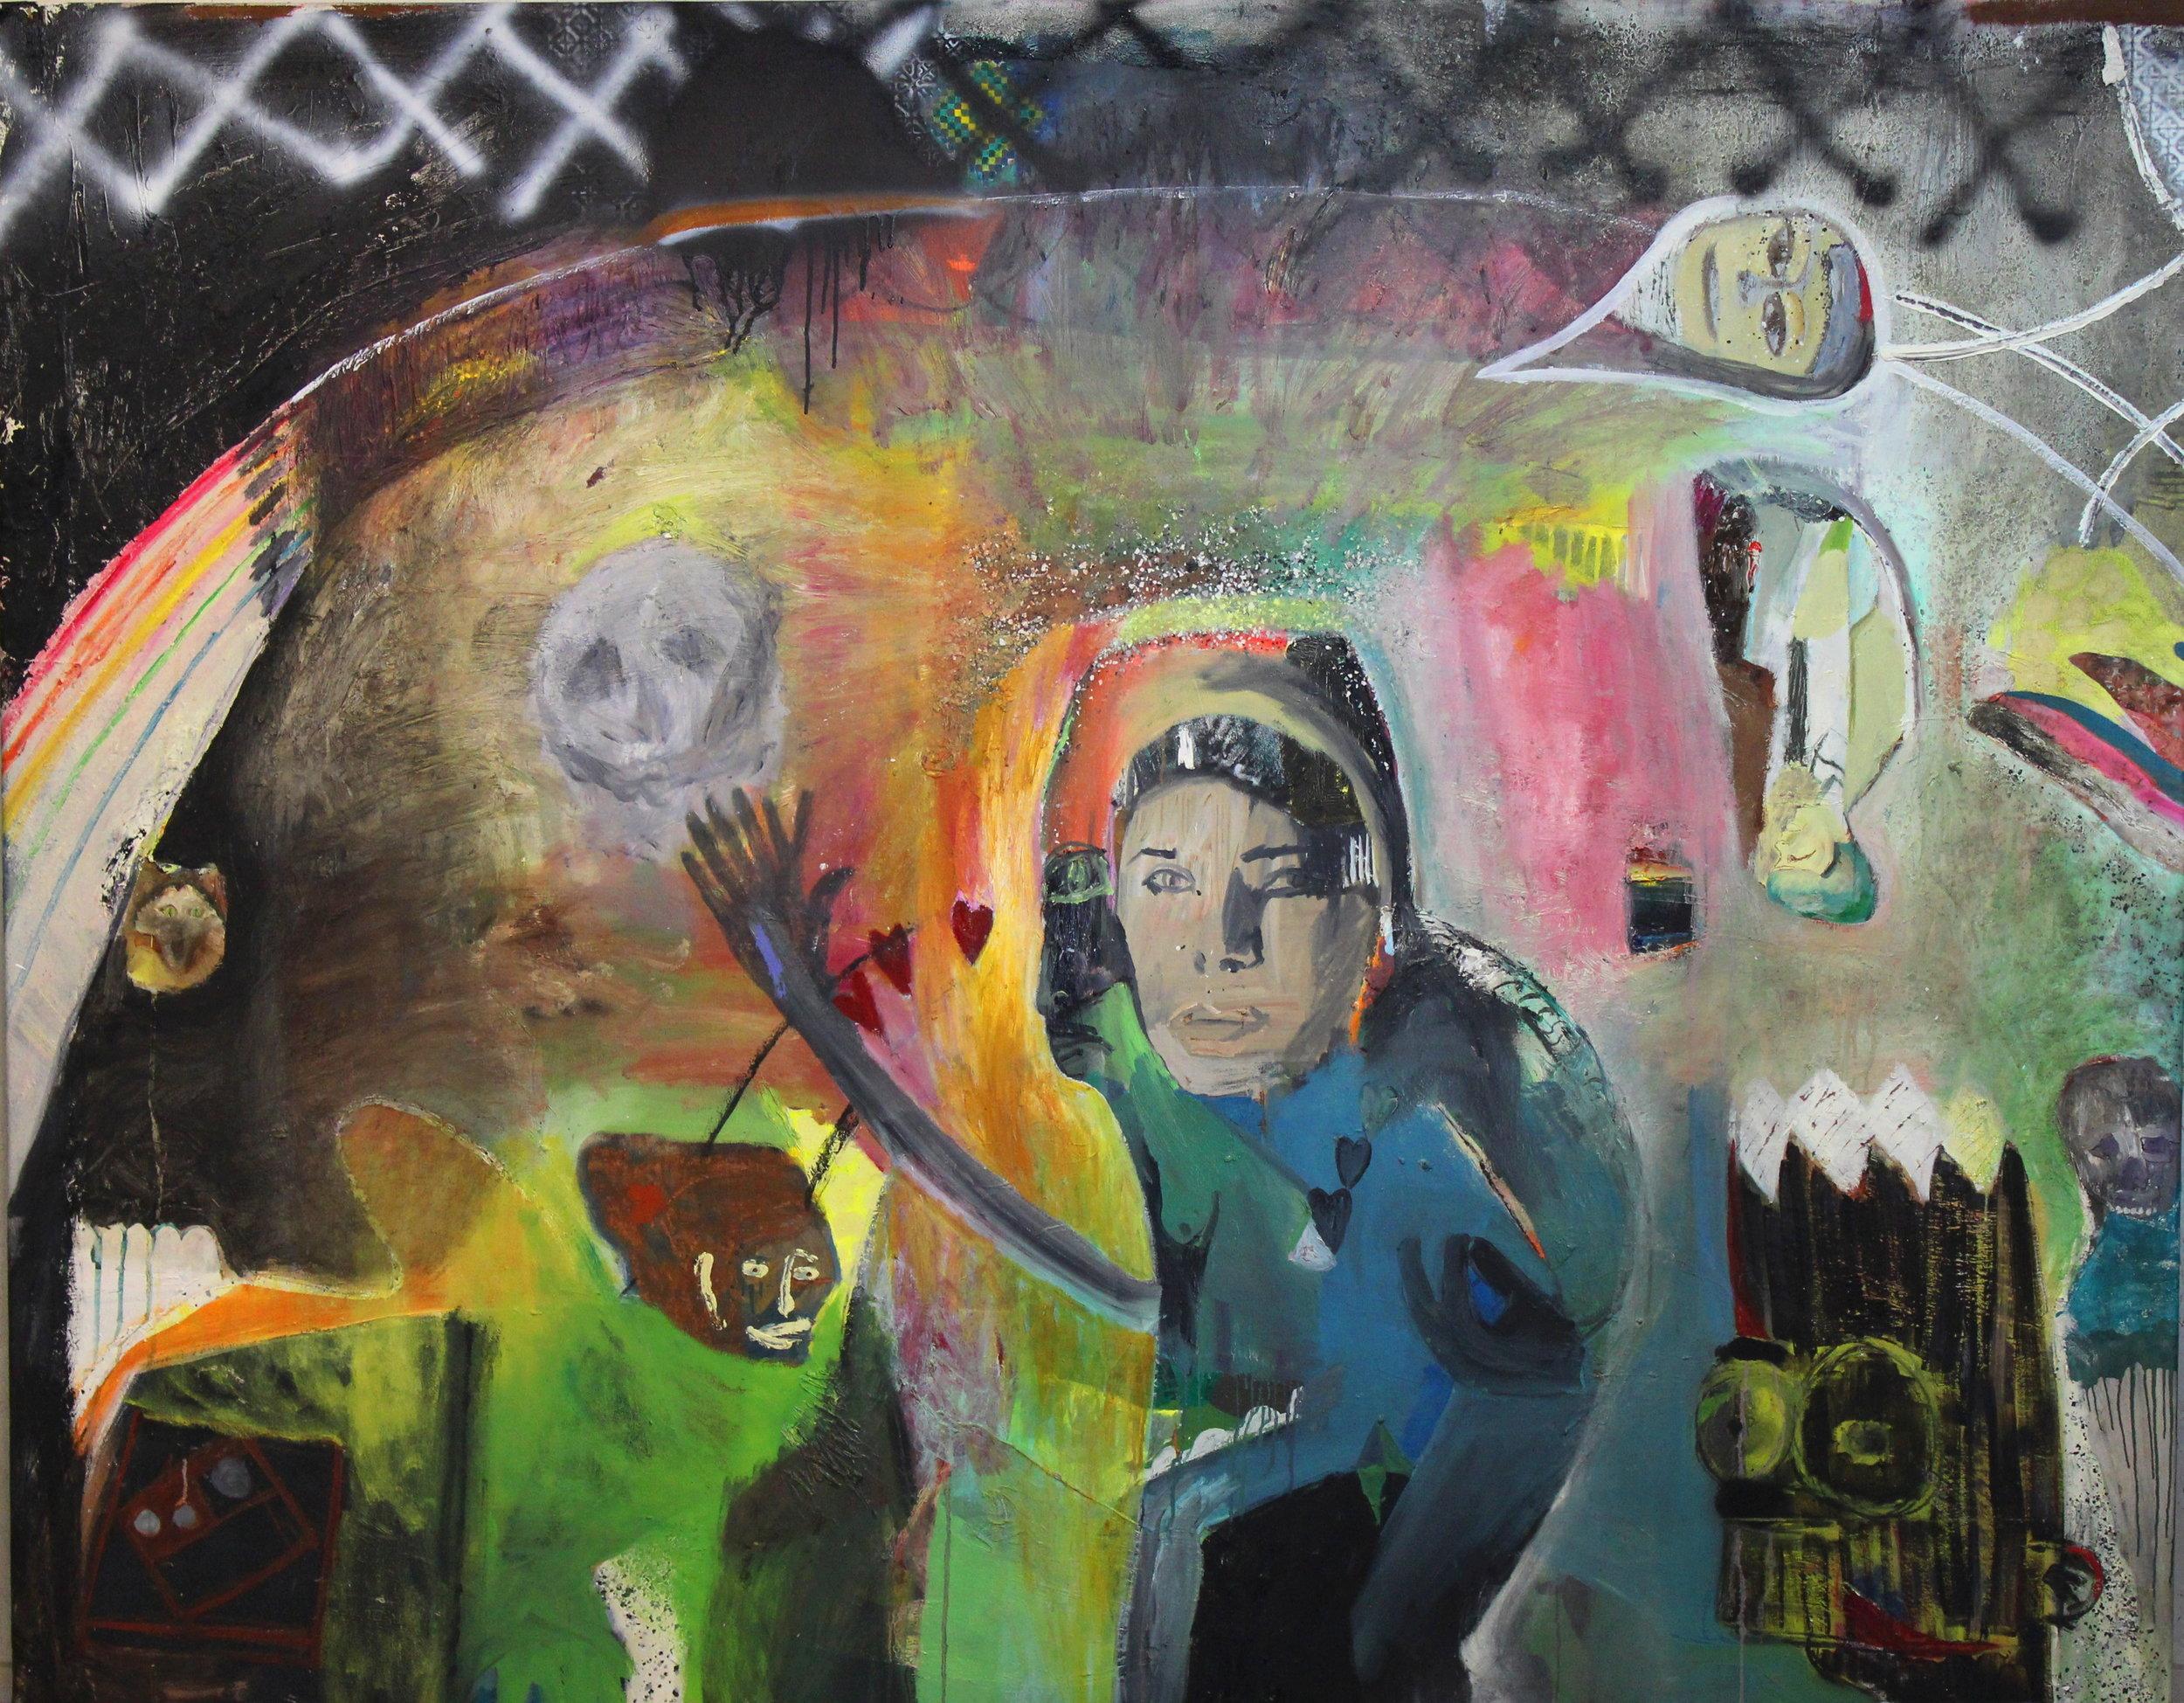 "The Very Last Day   acrylic, oil, glitter, spray paint on canvas  66"" x 83 1/2""  2018   Available through The Red Arrow Gallery, Nashville, TN"